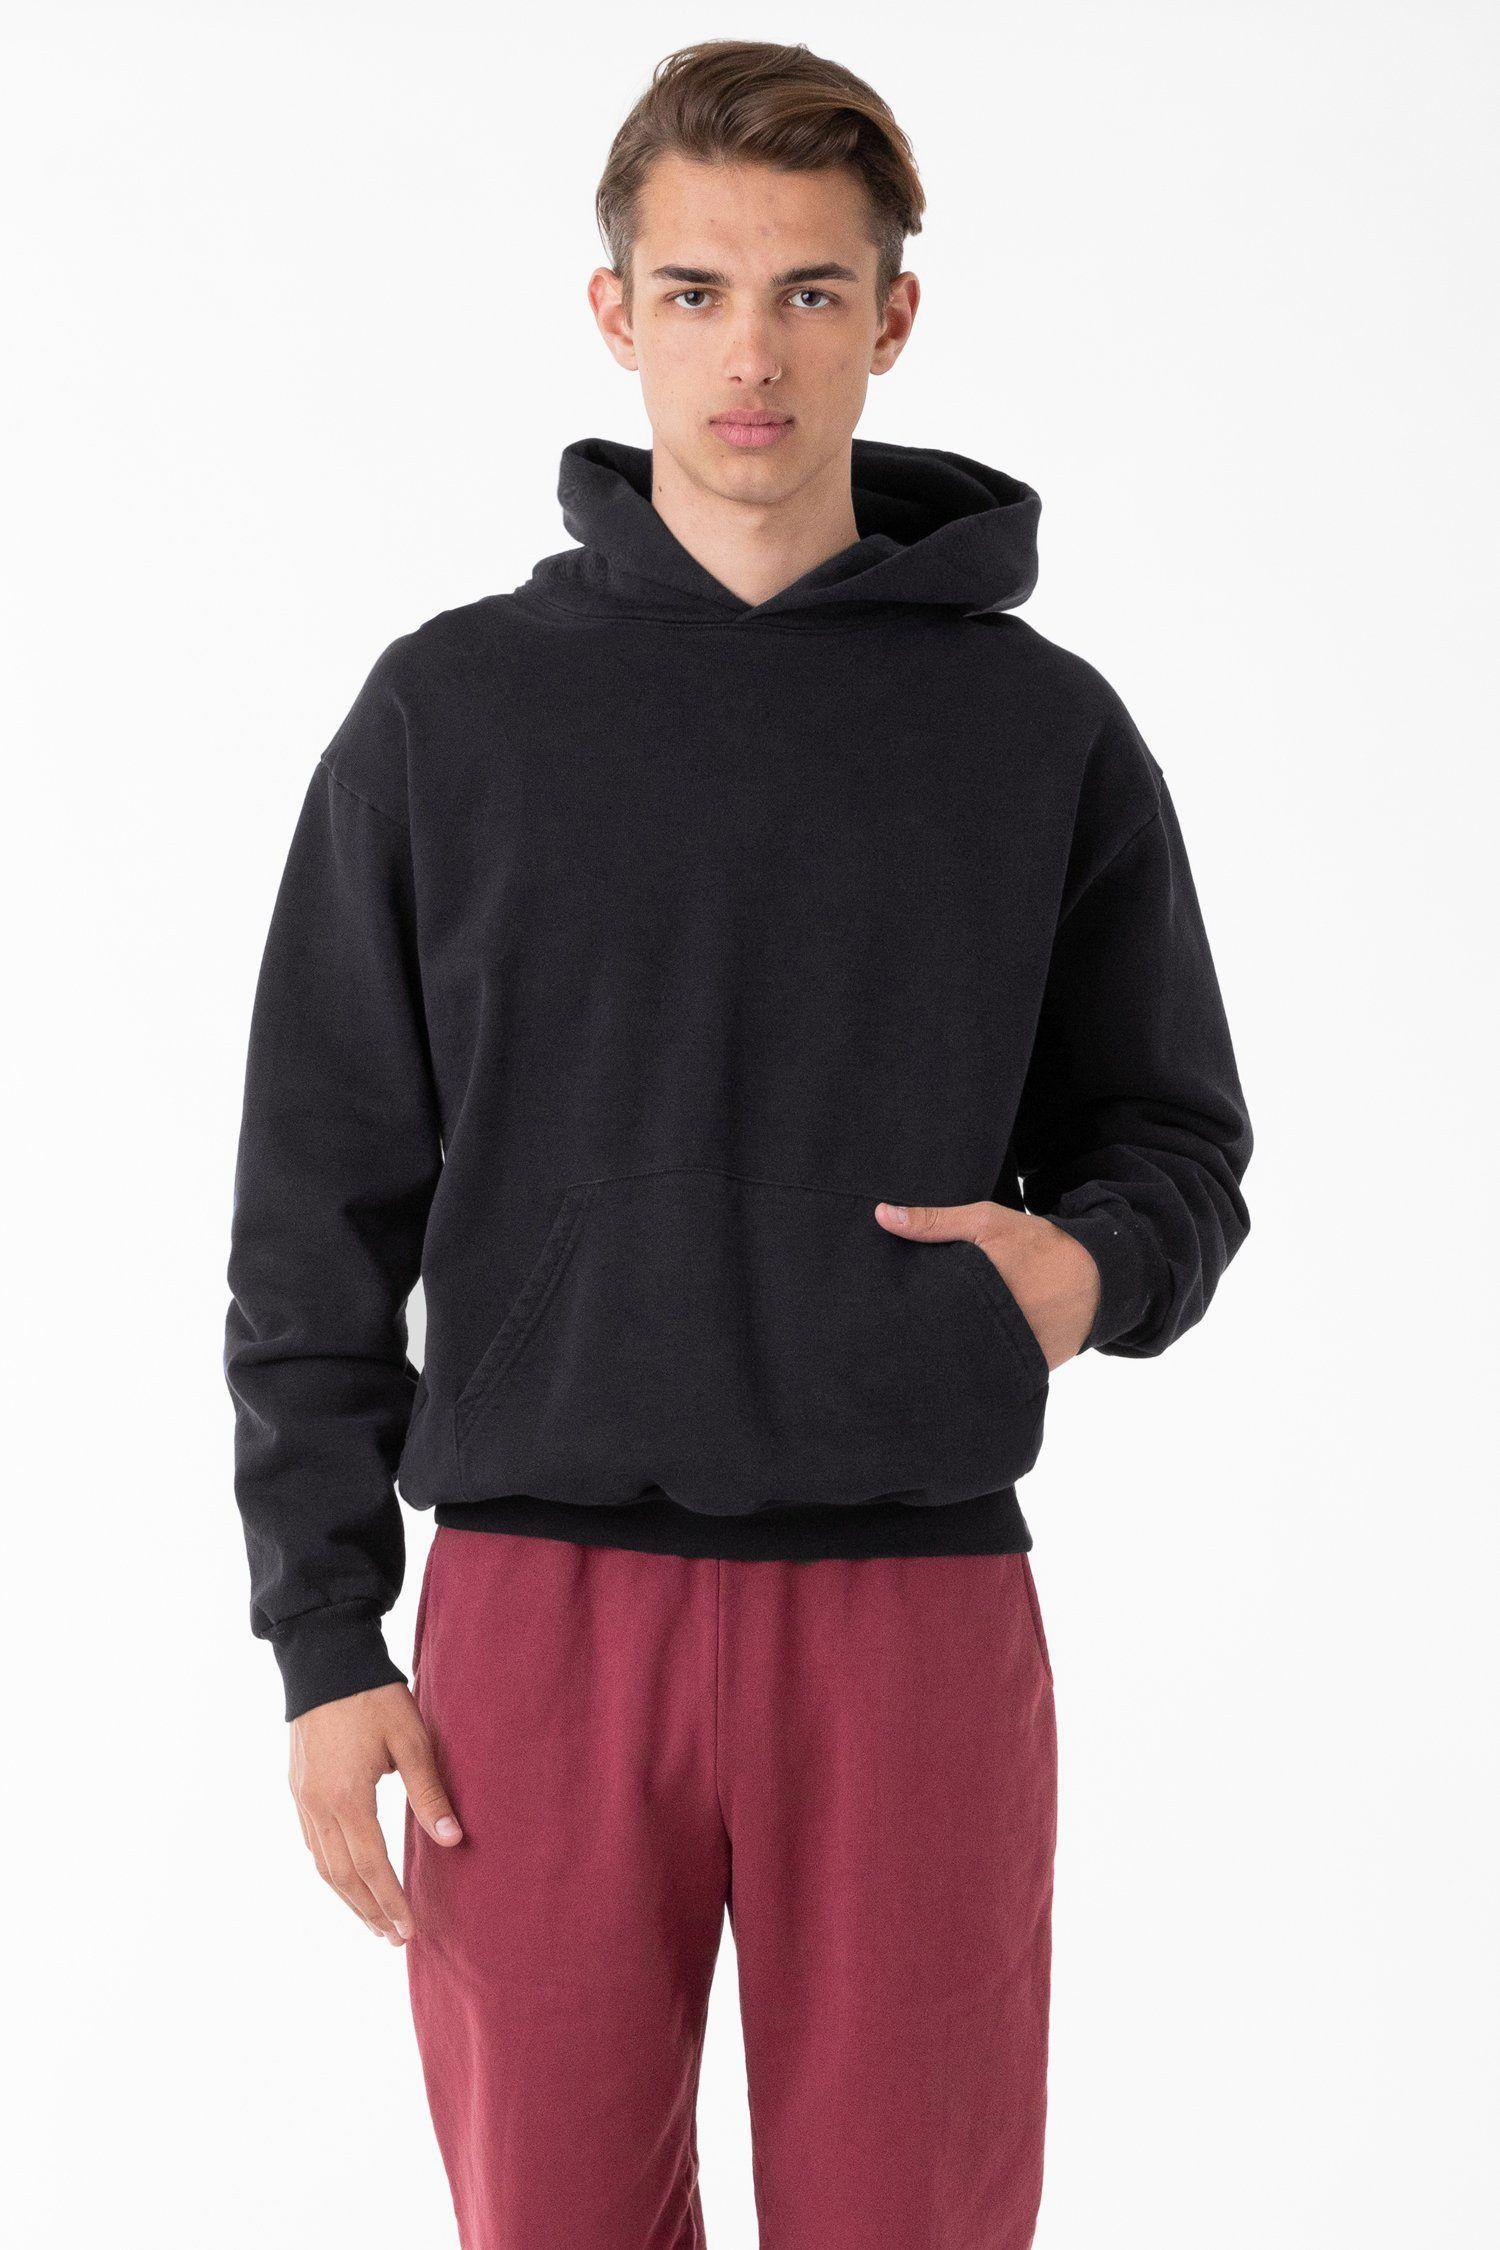 Hf09gd Garment Dye 14oz Heavy Fleece Hooded Pullover Sweatshirt Hooded Pullover Pullover Sweatshirt Garment Dye